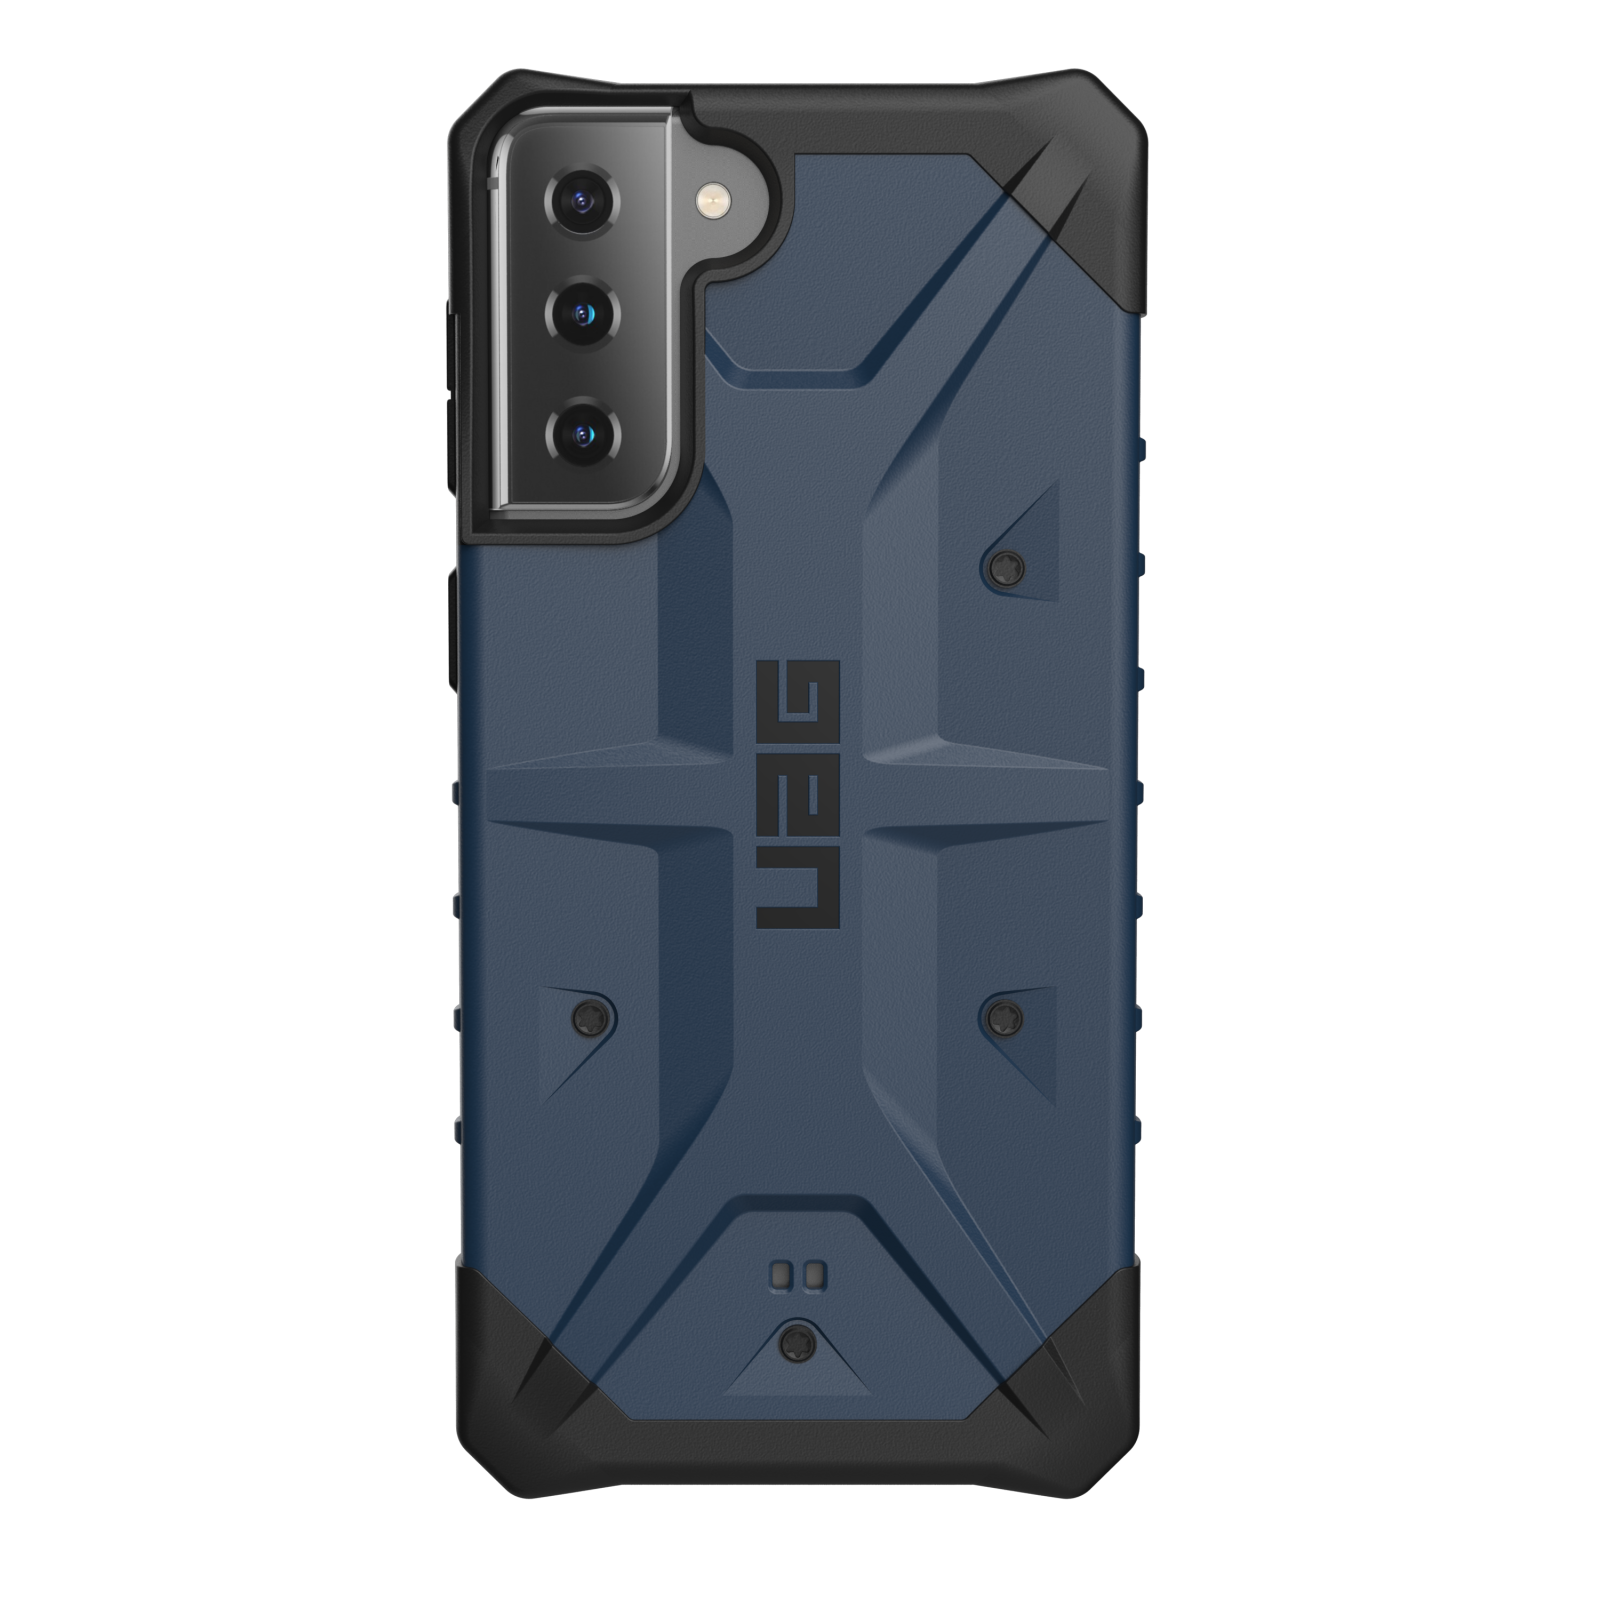 Pathfinder Series Case Galaxy S21 Plus Mallard